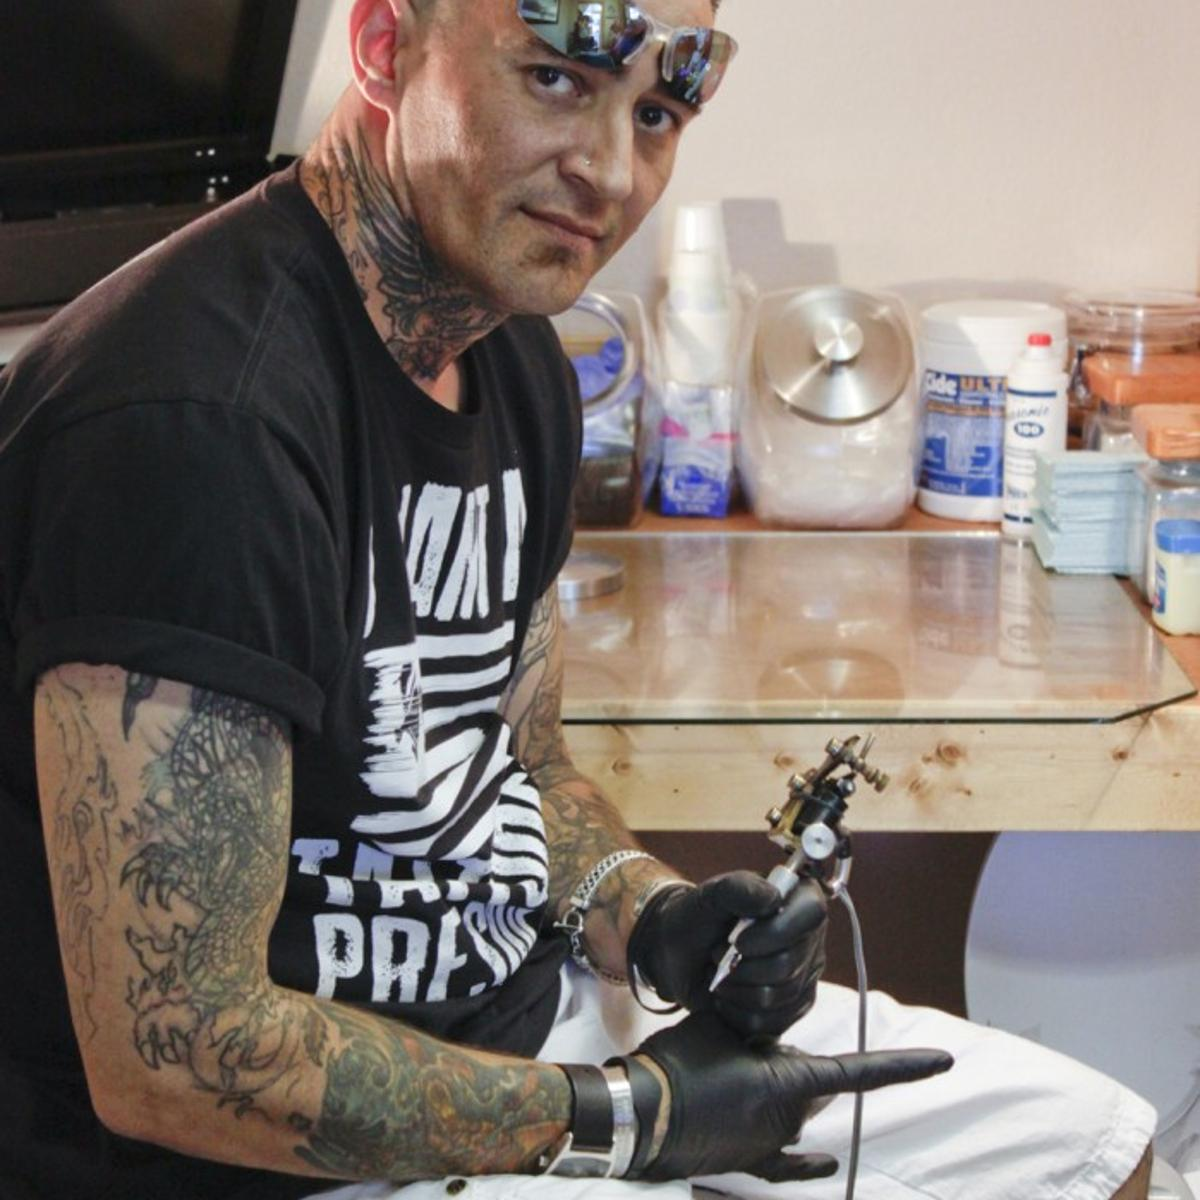 Custom Ink Tattoo Shop Creates One Of A Kind Artwork Local Business Ravallirepublic Com